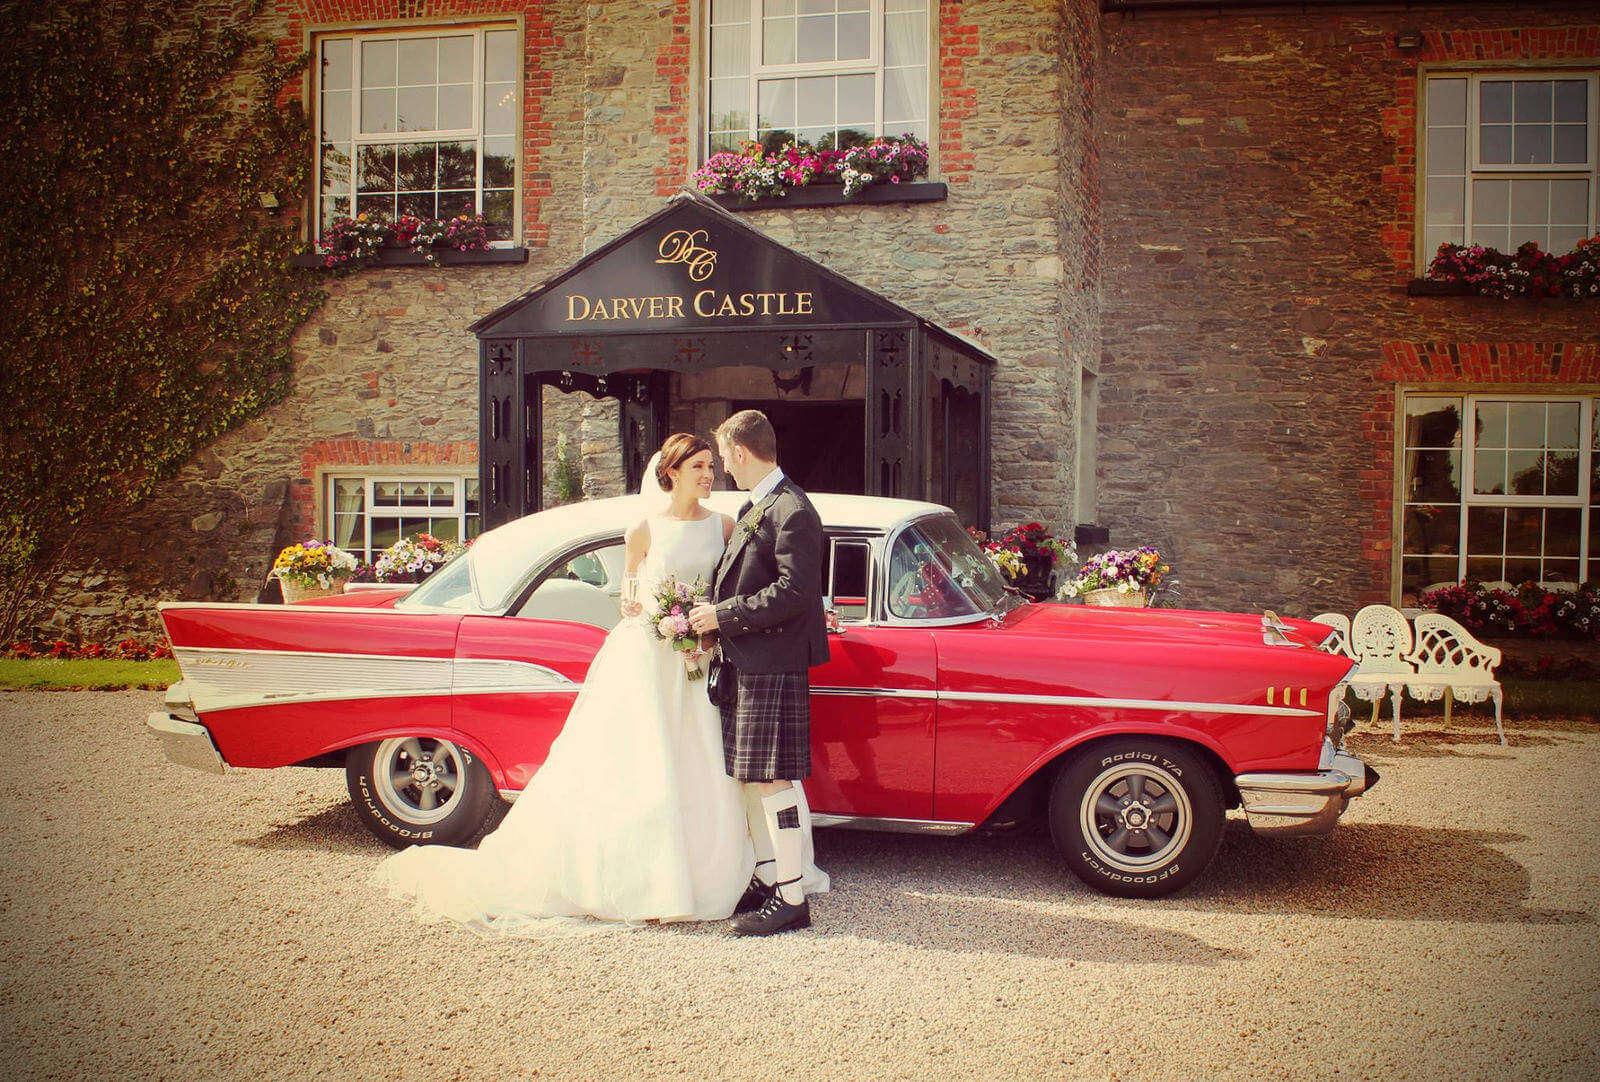 Wedding Bands Ireland - Wedding Suppliers - Darver Castle